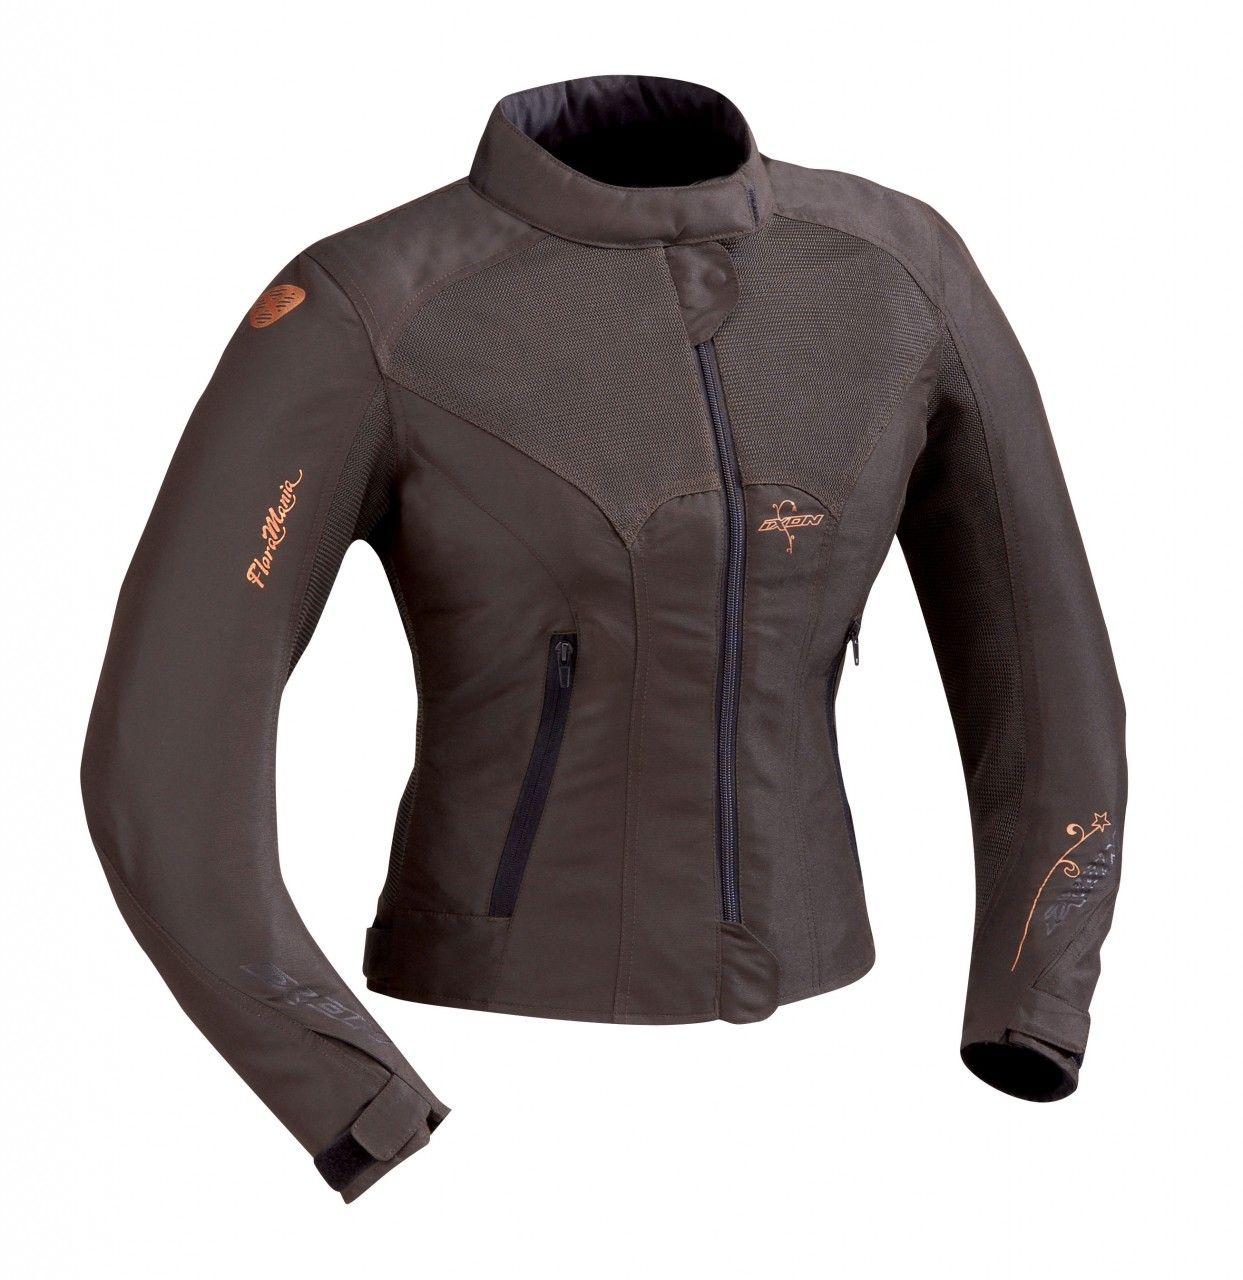 AUD 190 A feminine/smart casual lowkey textile jacket